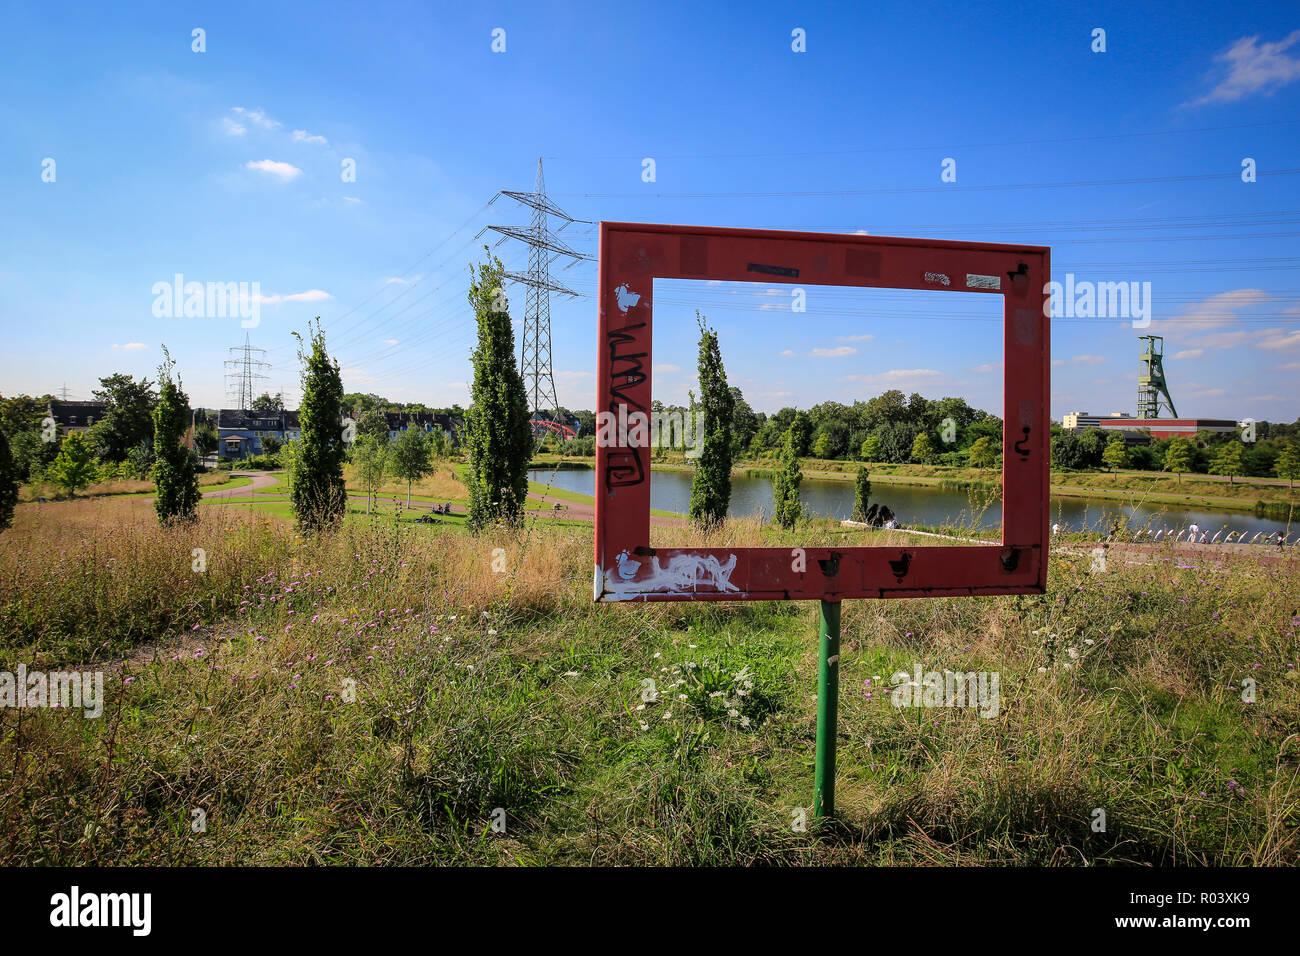 Essen, Ruhr area, Germany, Krupp-Park, lake, urban development project Krupp-Guertel - Stock Image